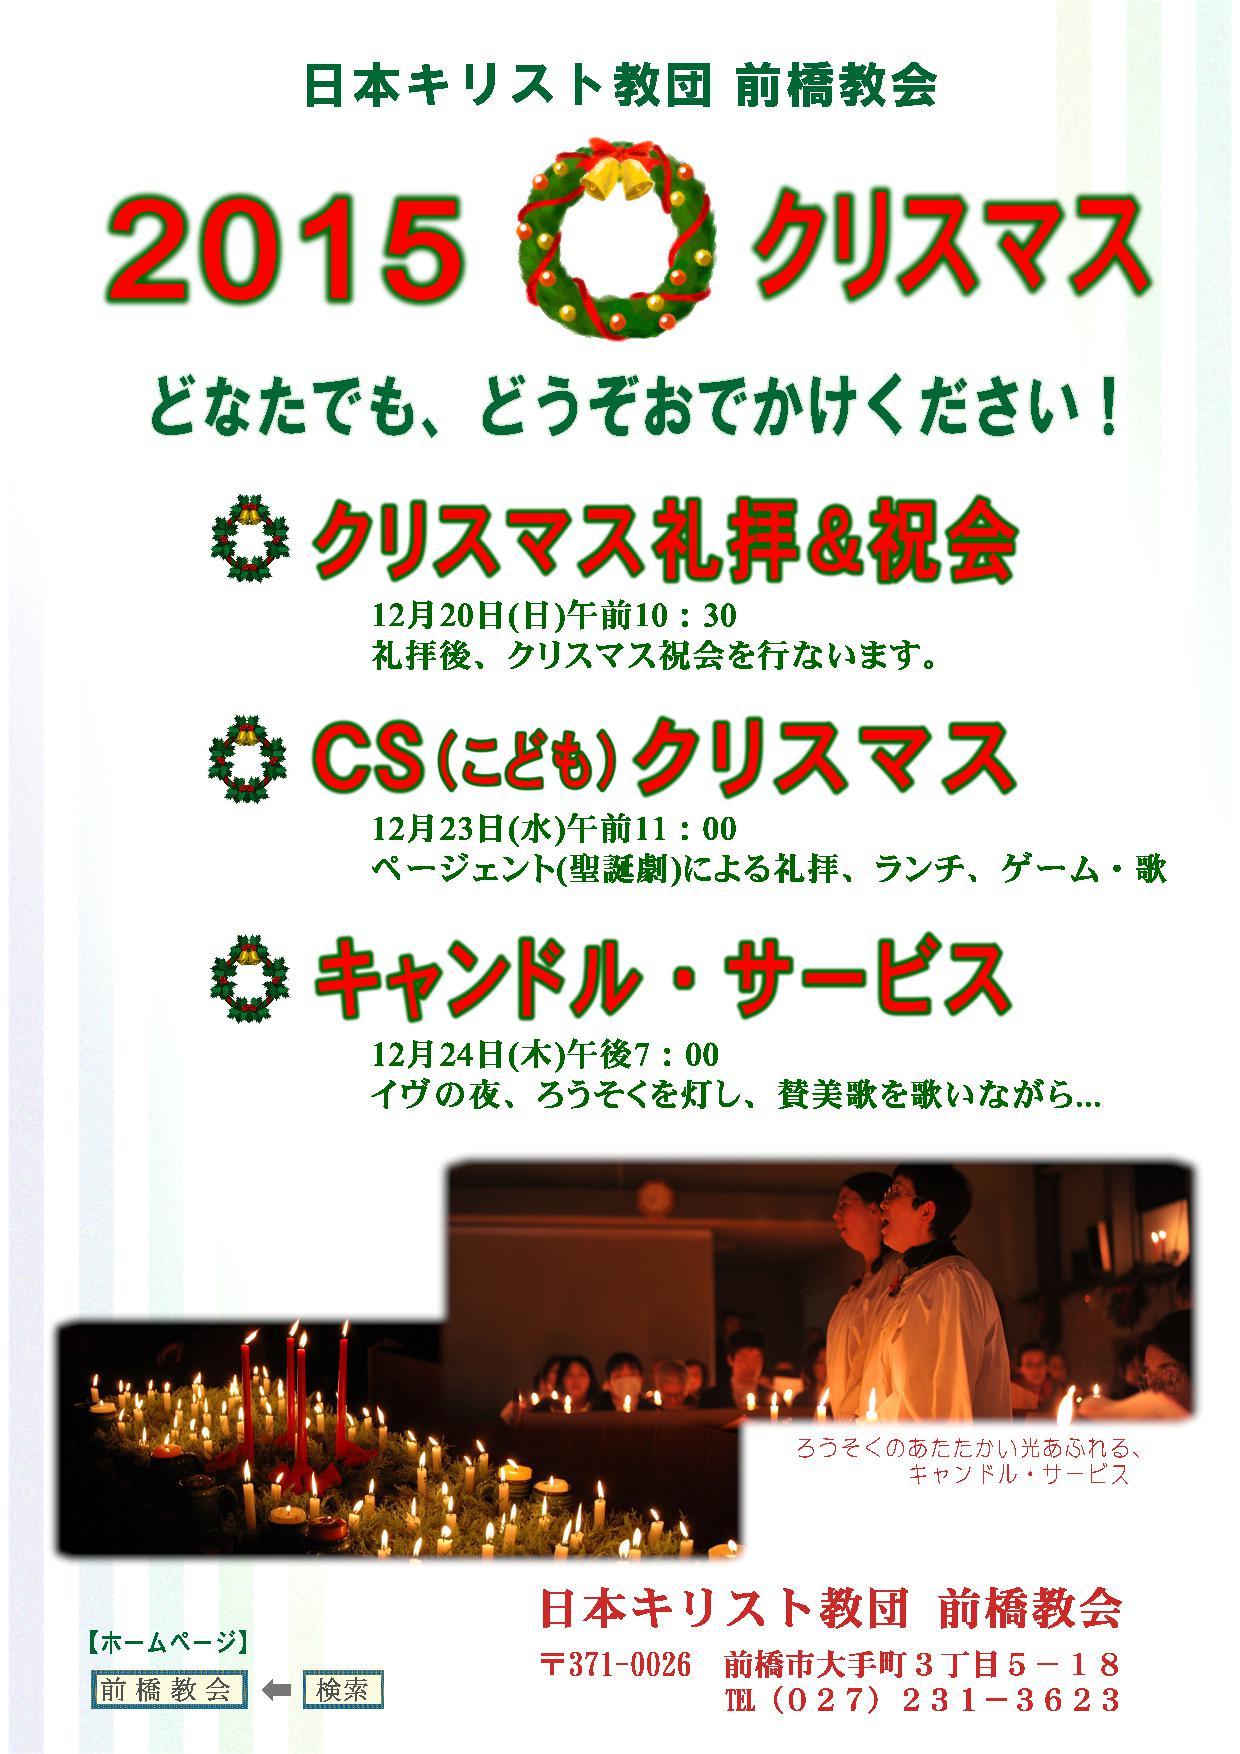 LMIGHTYEX-2015 クリスマス チラシ